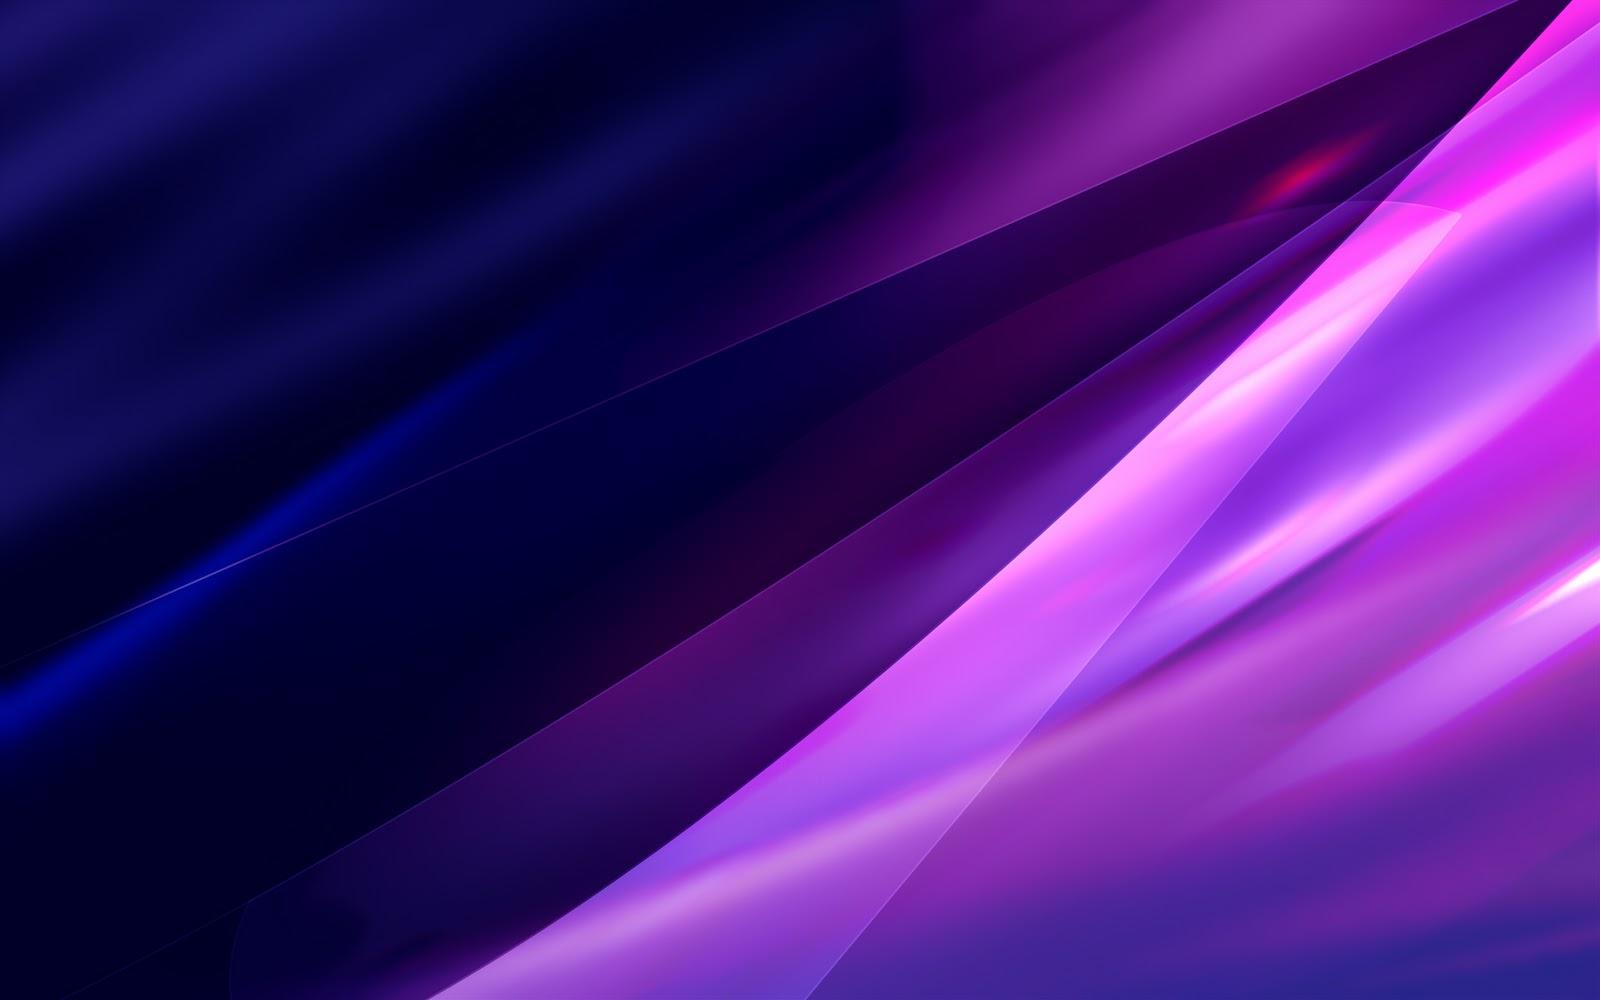 powerpoint template size pixels - purple backgrounds 18540 1600x1000px